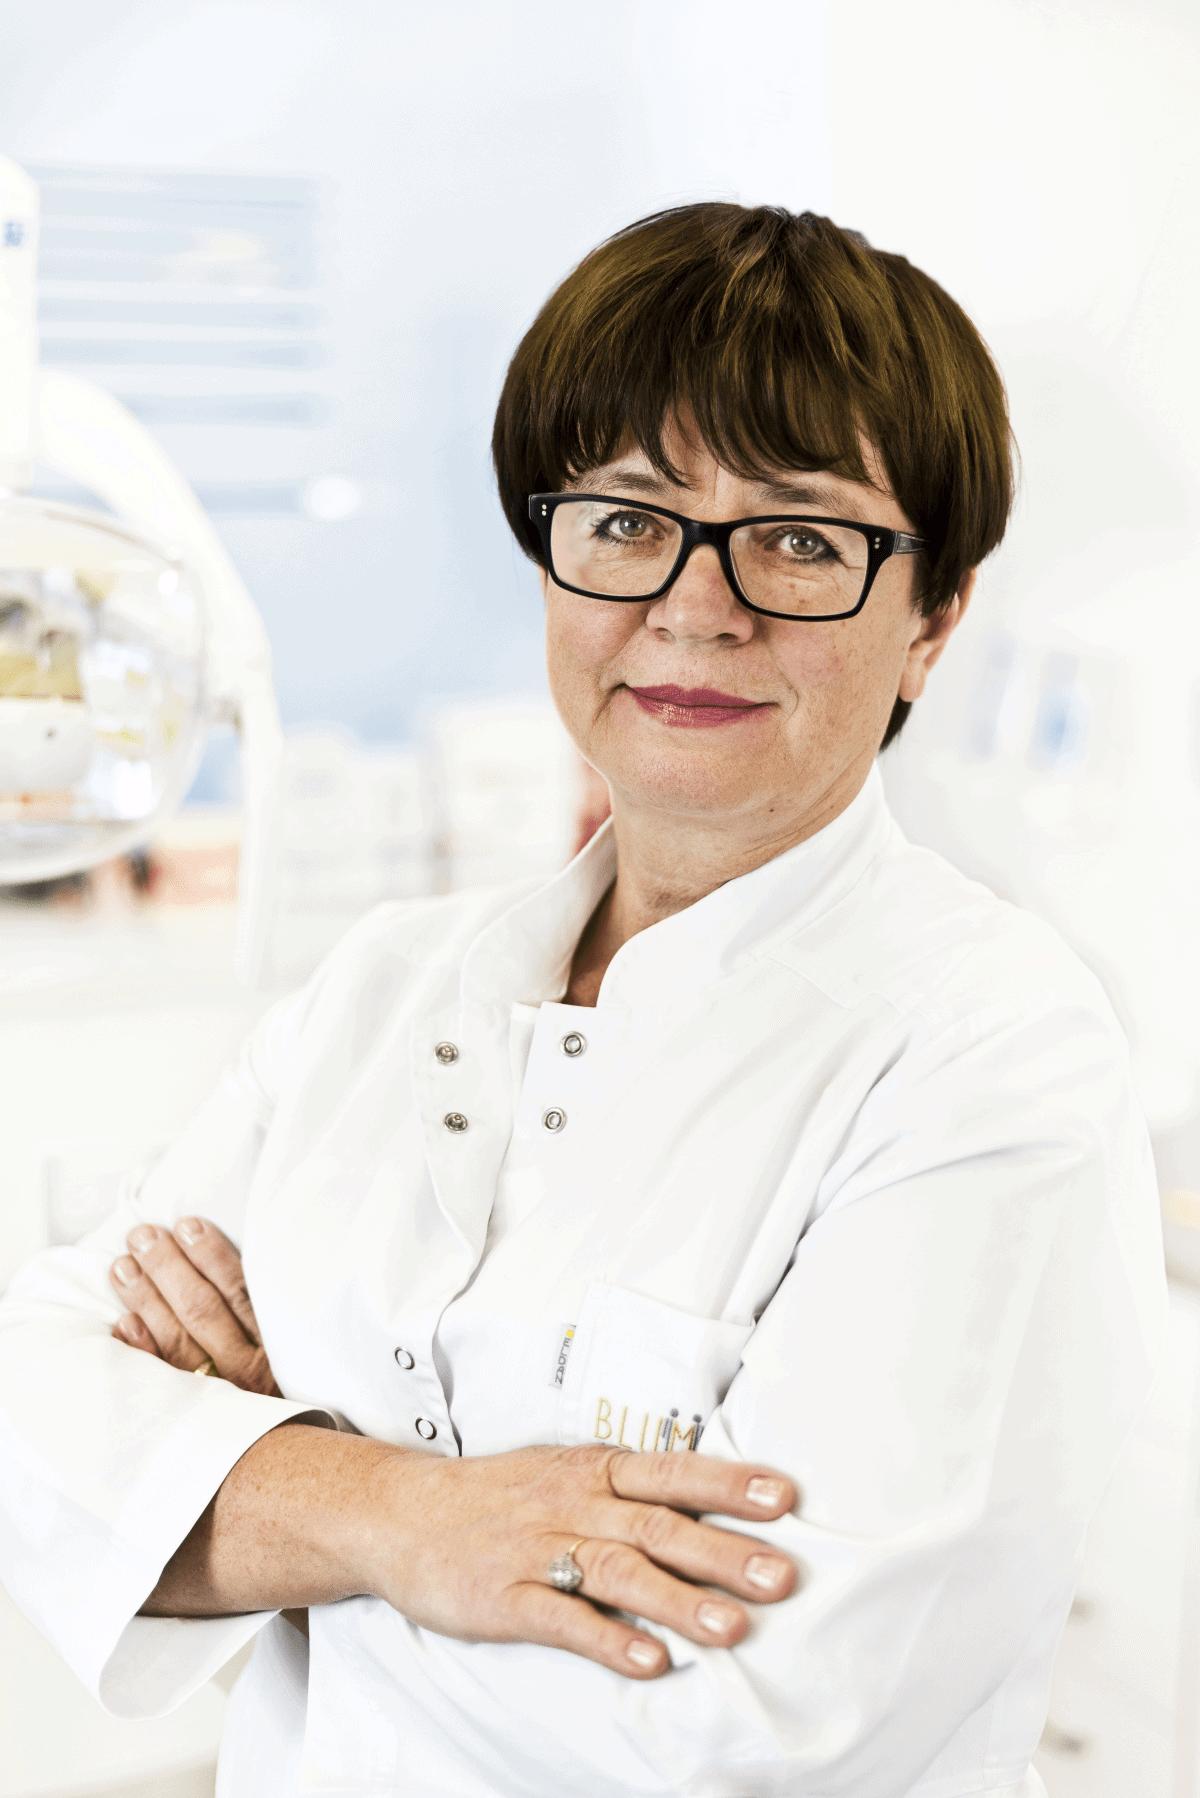 dr Anna Blumska stomatolog